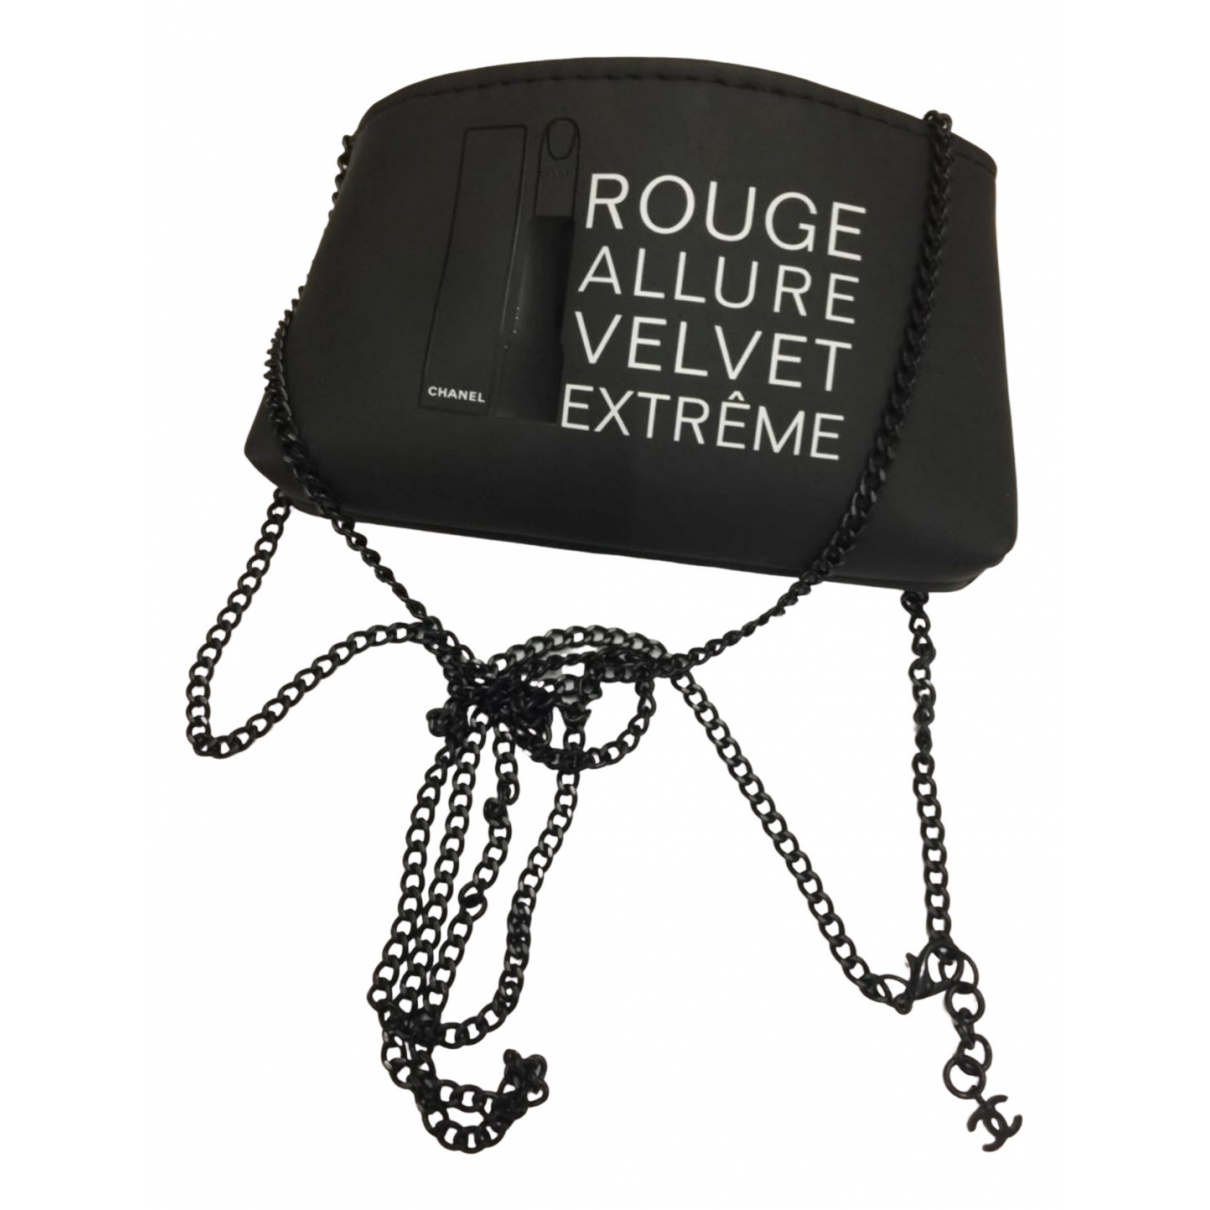 Bolsos clutch Mademoiselle en Poliester Negro Chanel